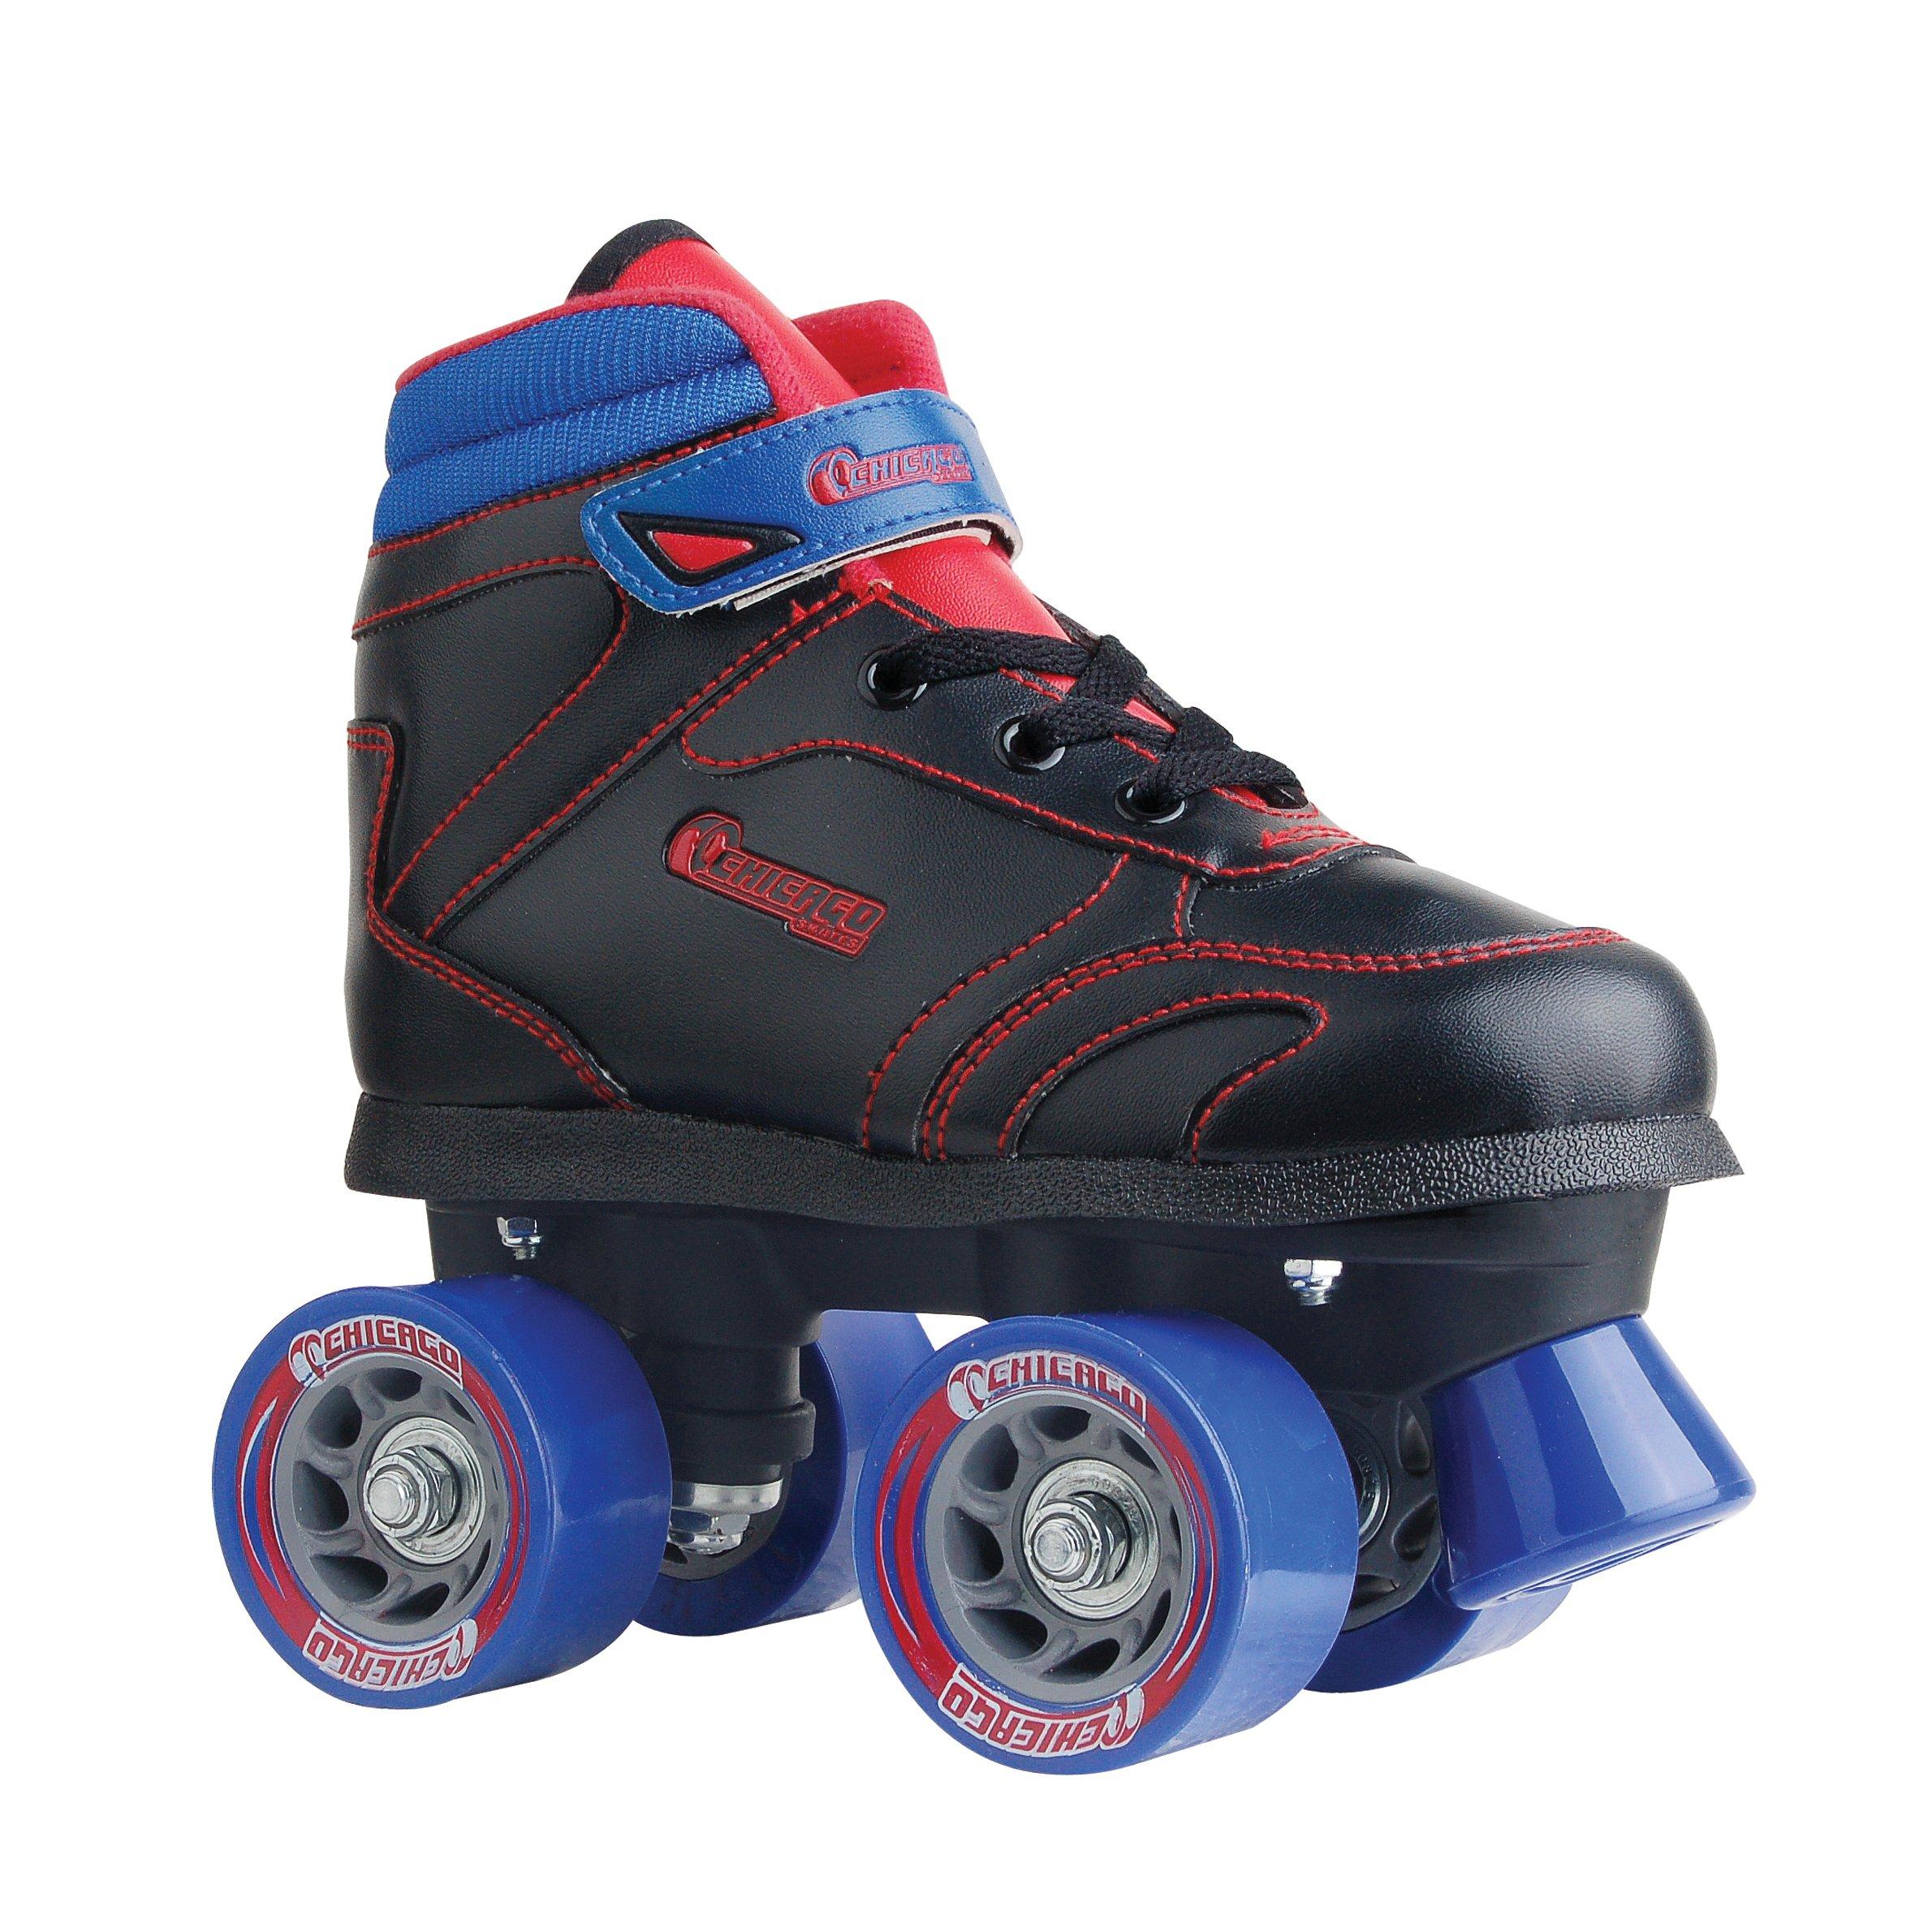 Chicago Boys Sidewalk Roller Skate- Black Size 1